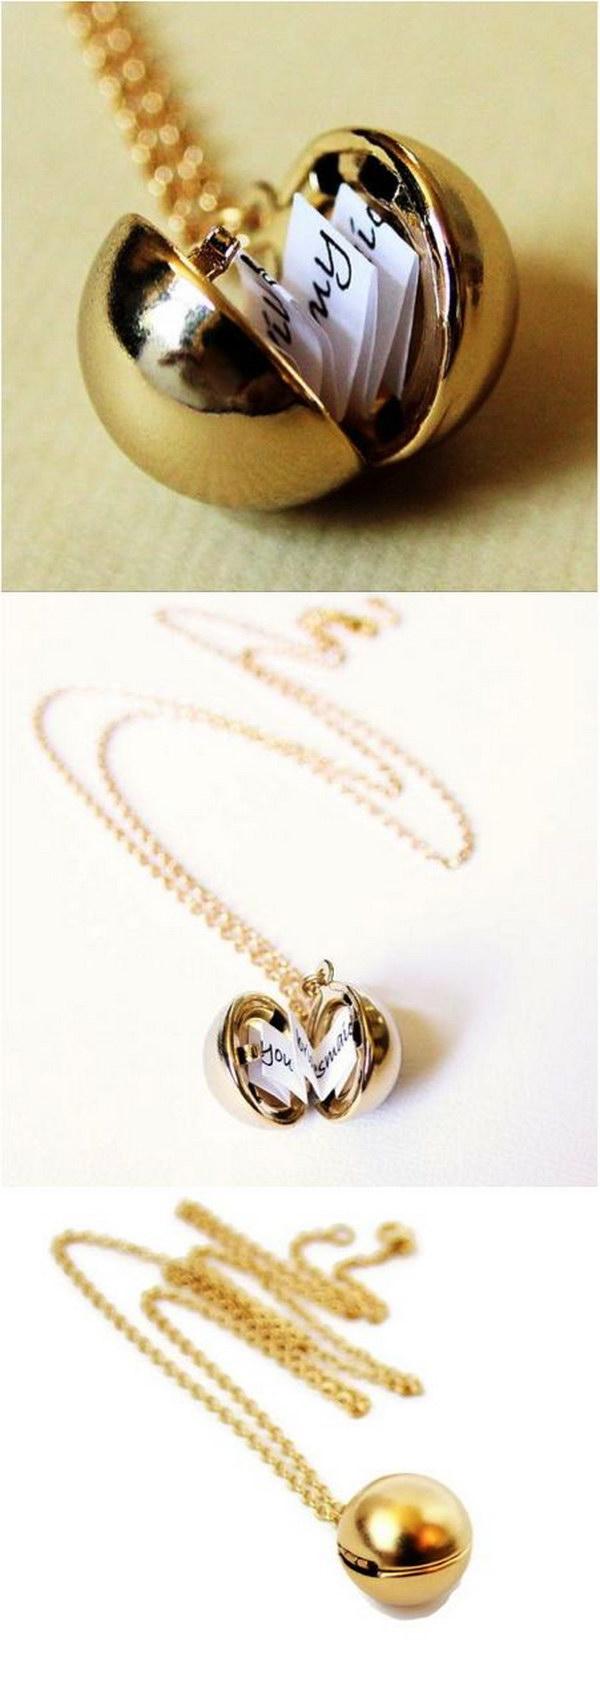 6 Secret Message Ball Locket Necklace